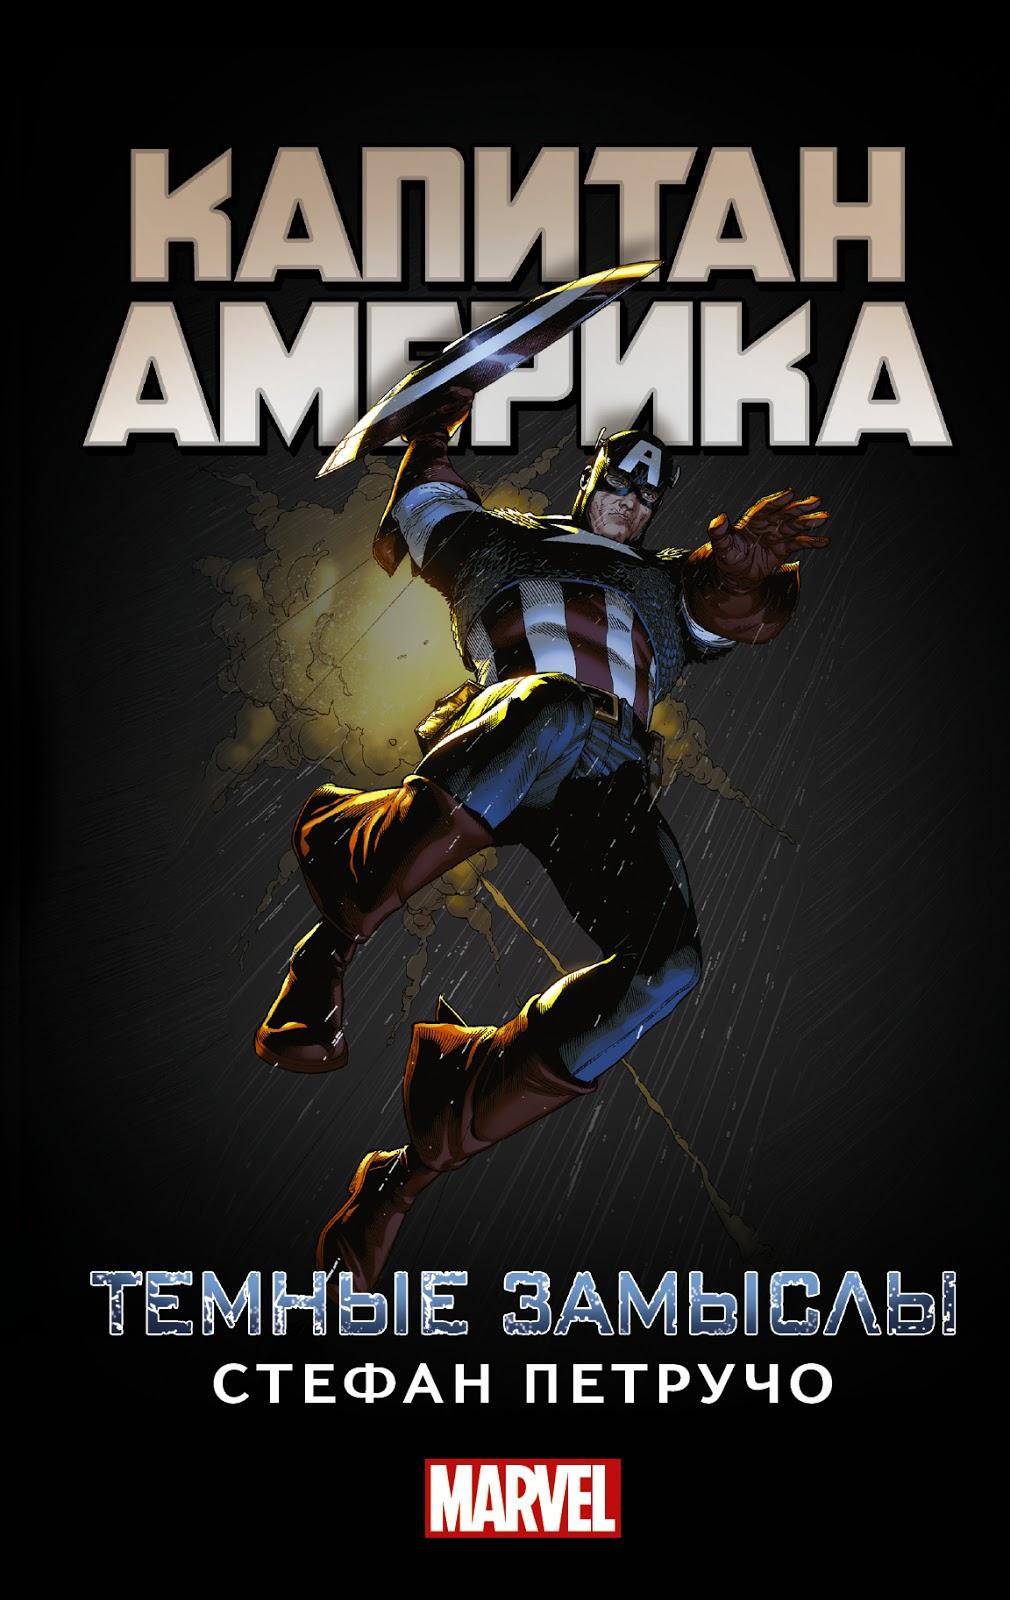 Стефан Петручо — Капитан Америка: Темные замыслы (2016)